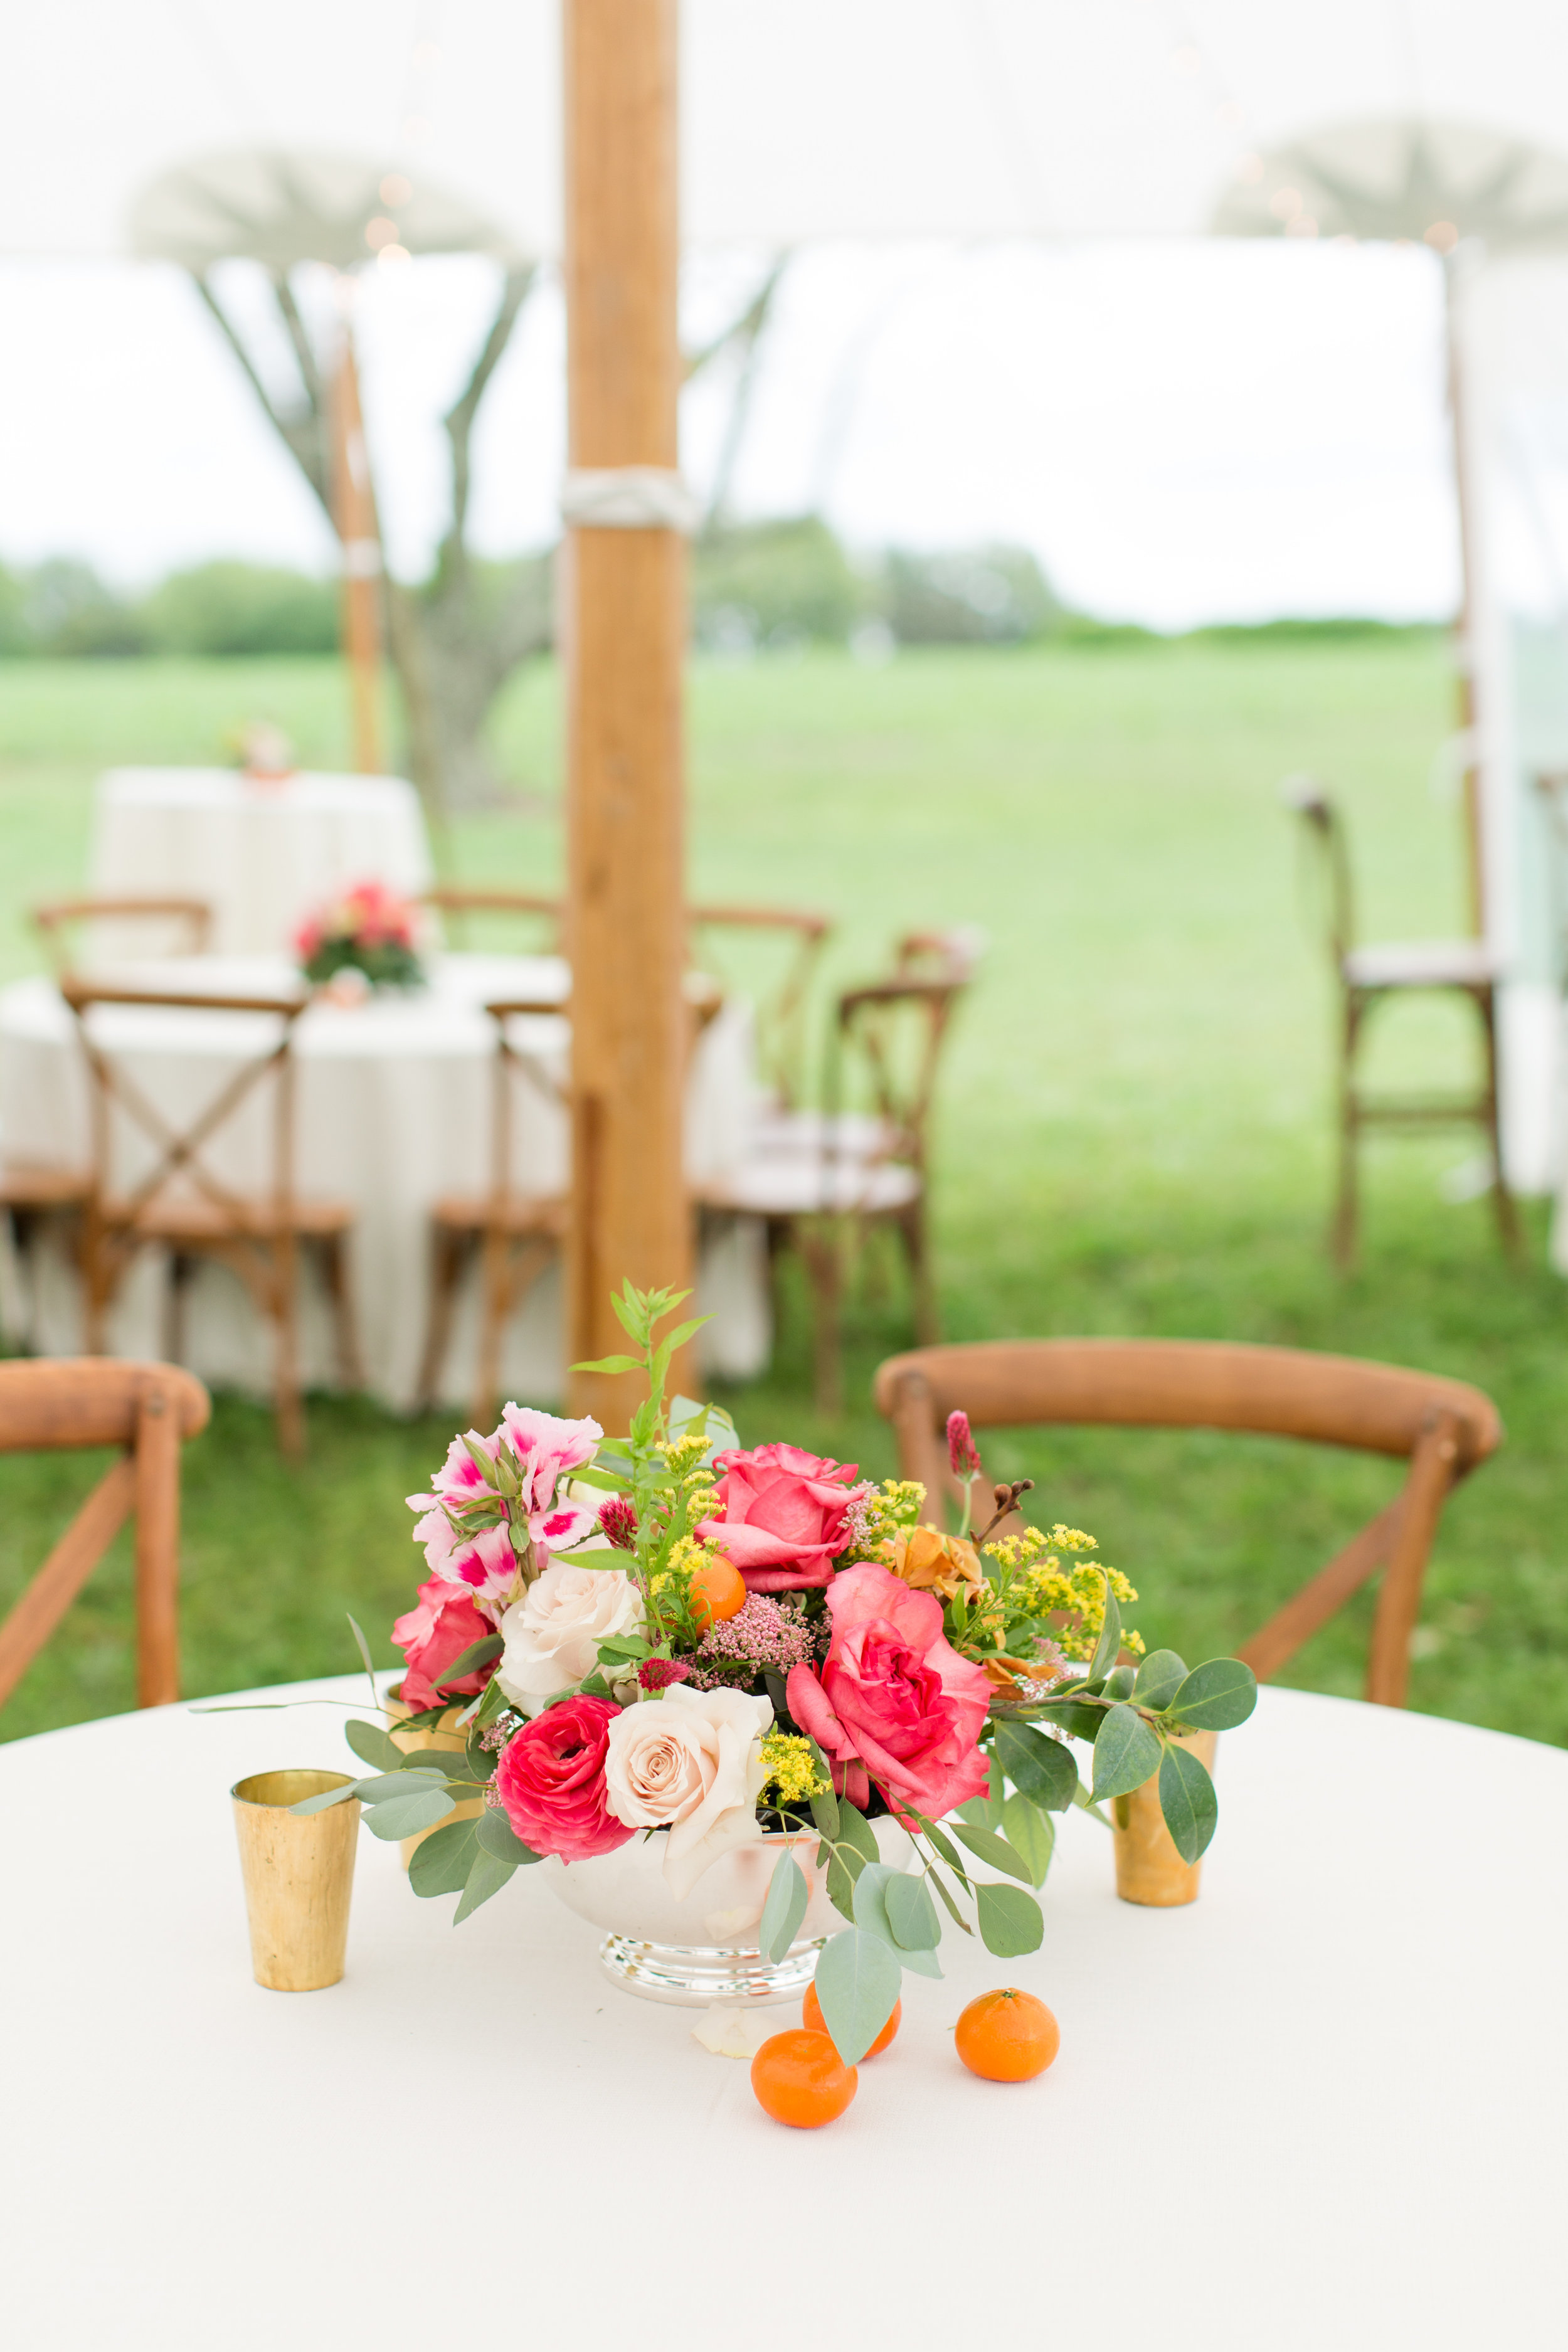 0001-EGP-2018-Palesano-Wedding-22289.jpg